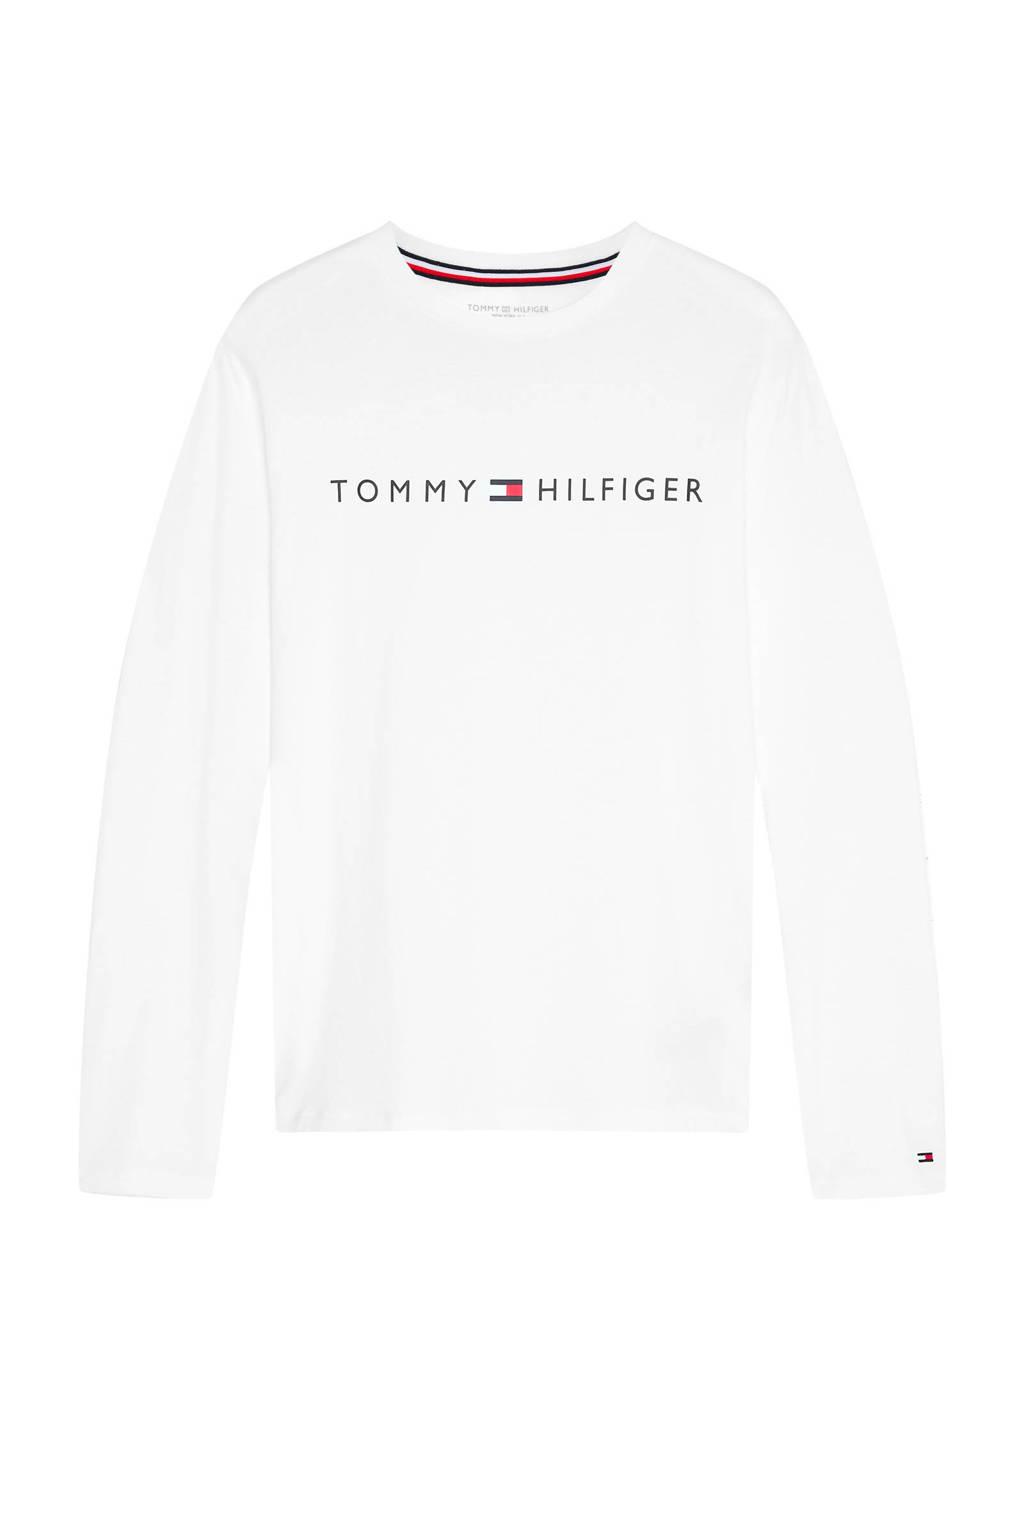 Tommy Hilfiger pyjamatop met logo wit, Wit